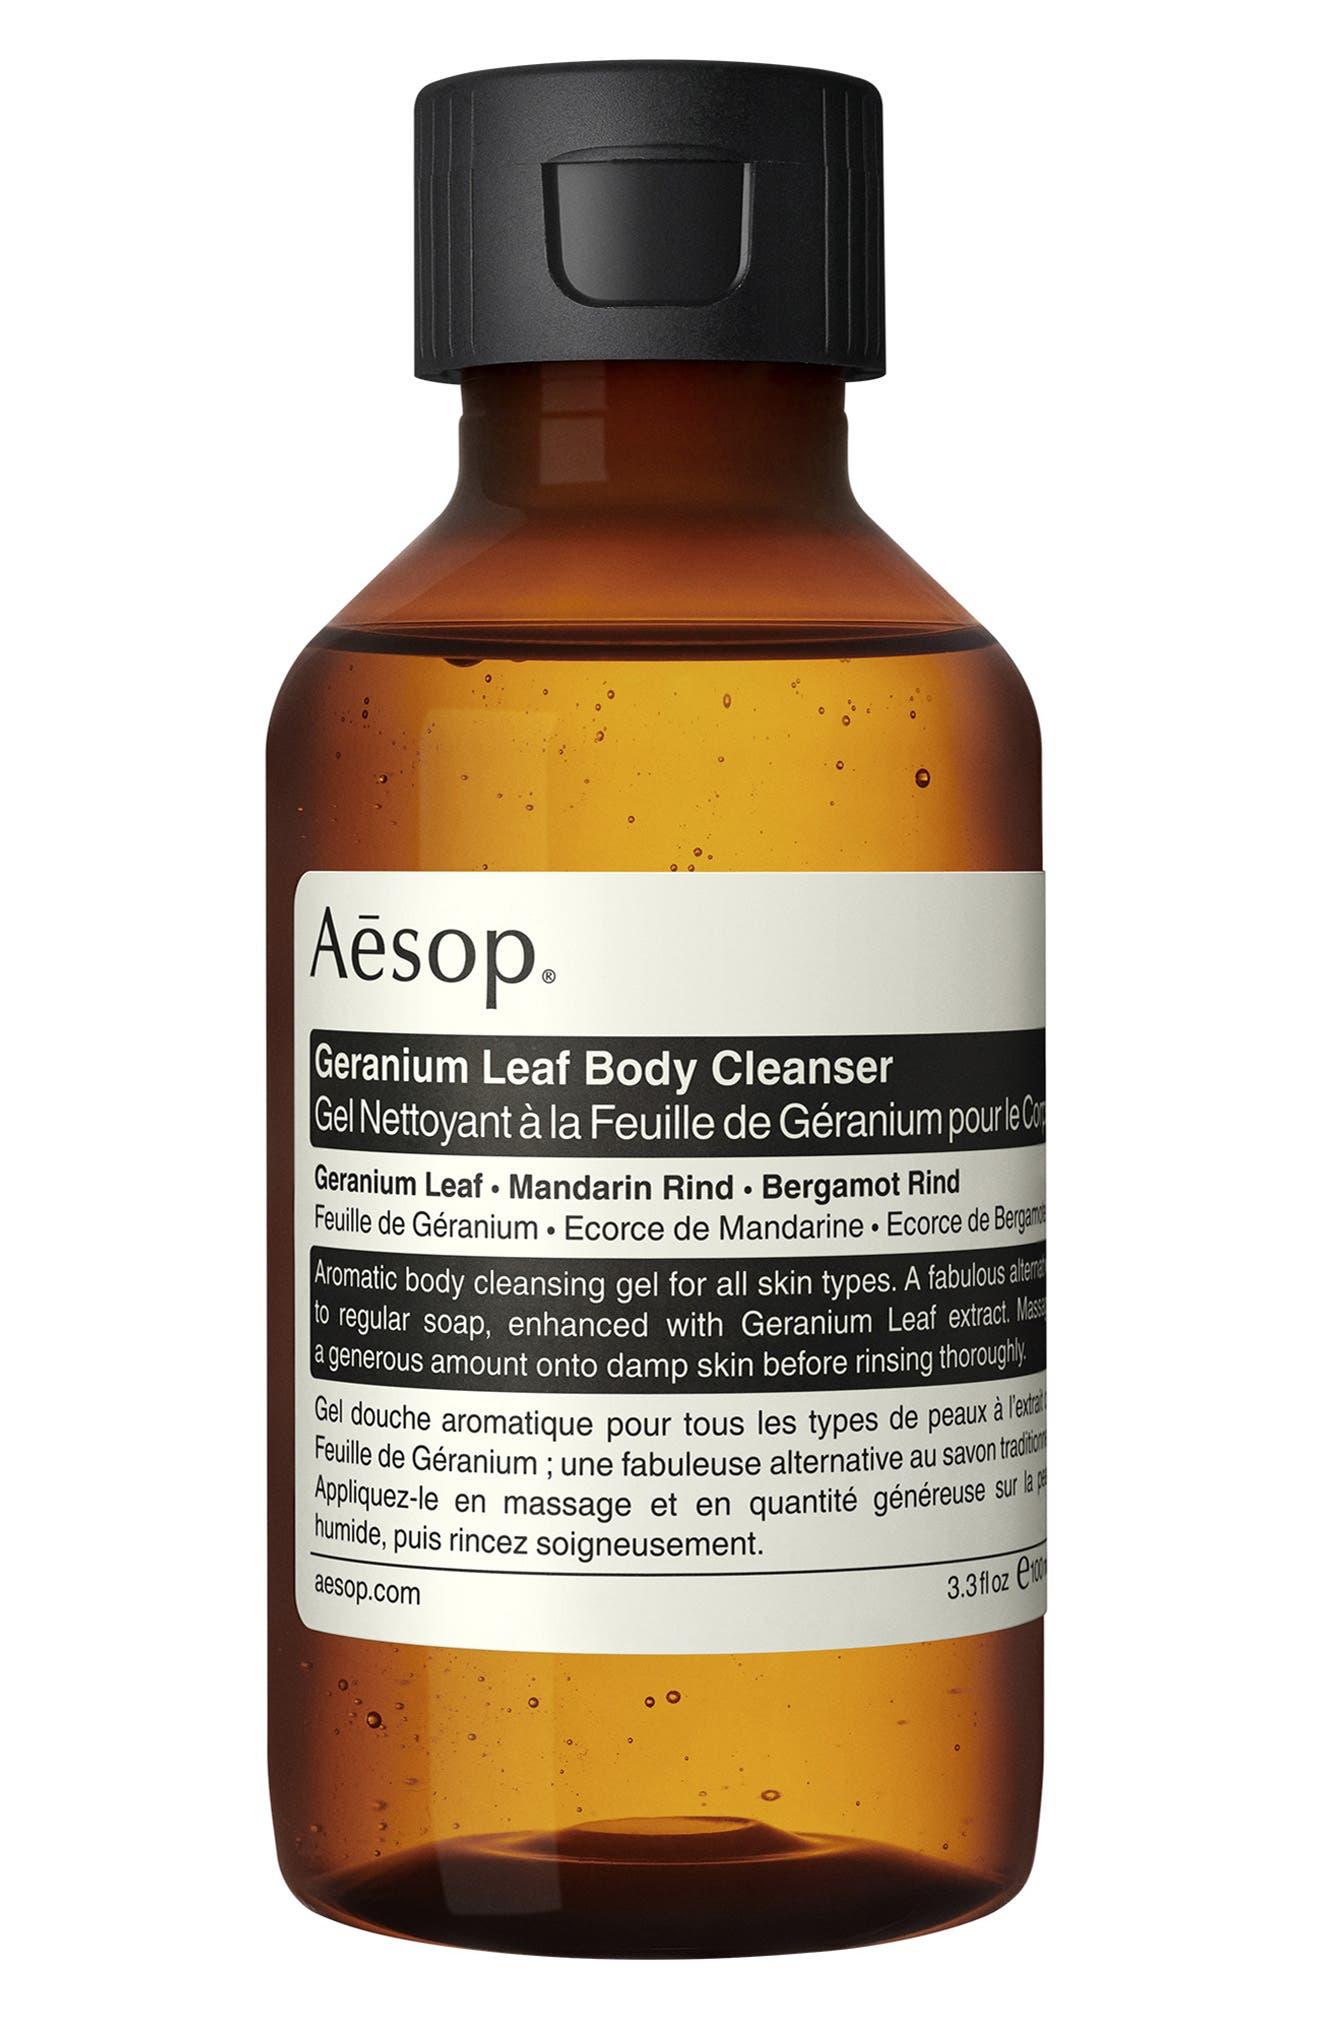 Geranium Leaf Body Cleanser | Nordstrom